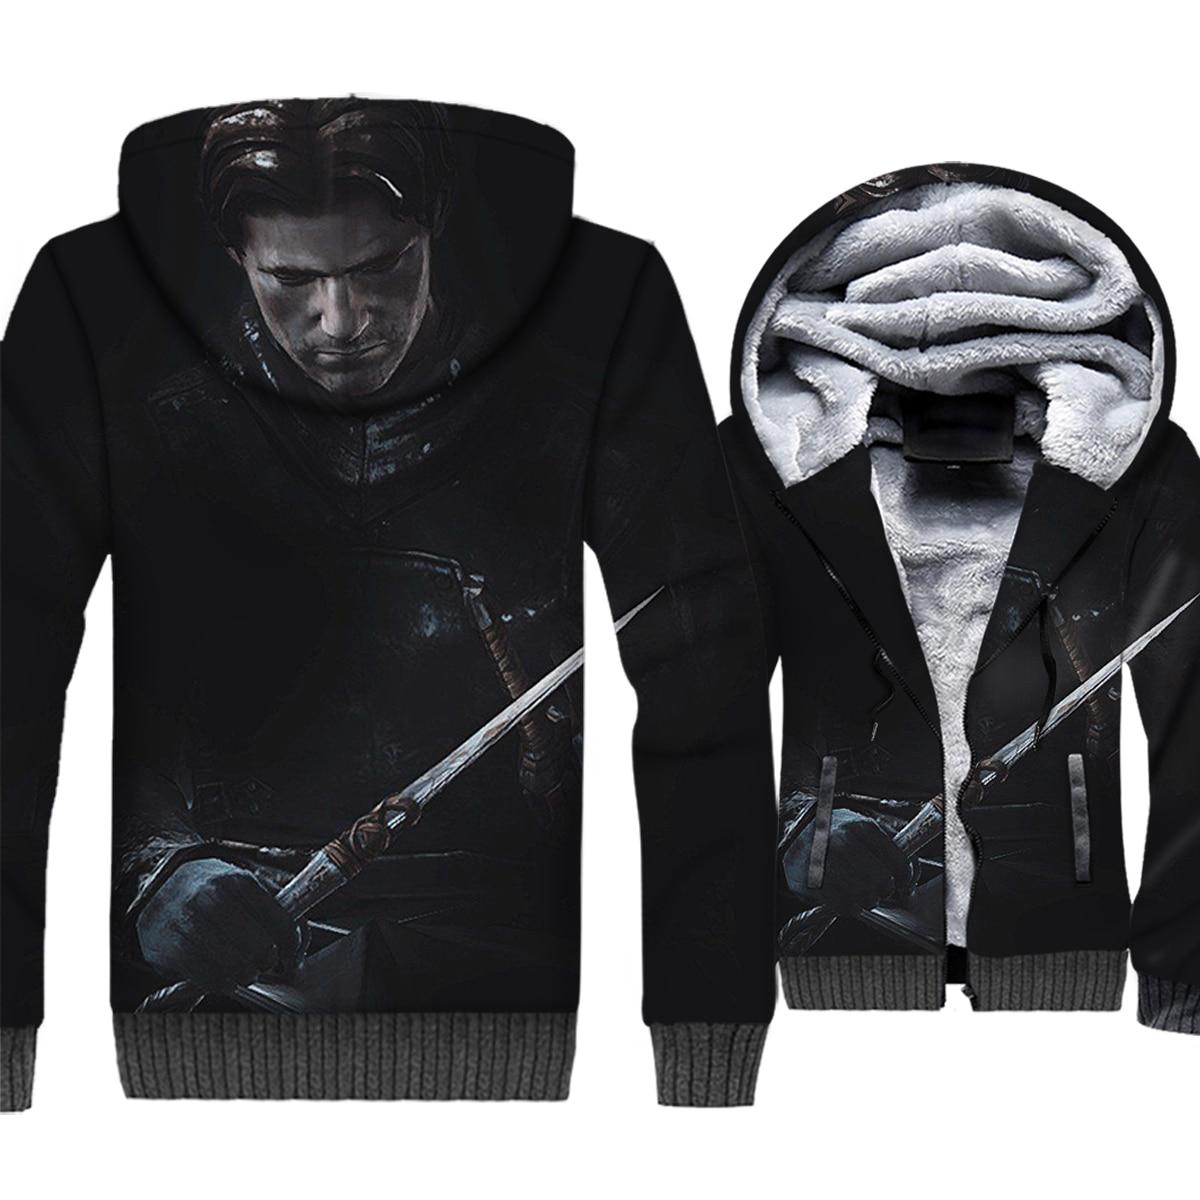 Game of Thrones 3D Print Hoodie Men Brienne House Lannister Jaime Lannister Sweatshirt Winter Thick Fleece Coat Tormund Jacket